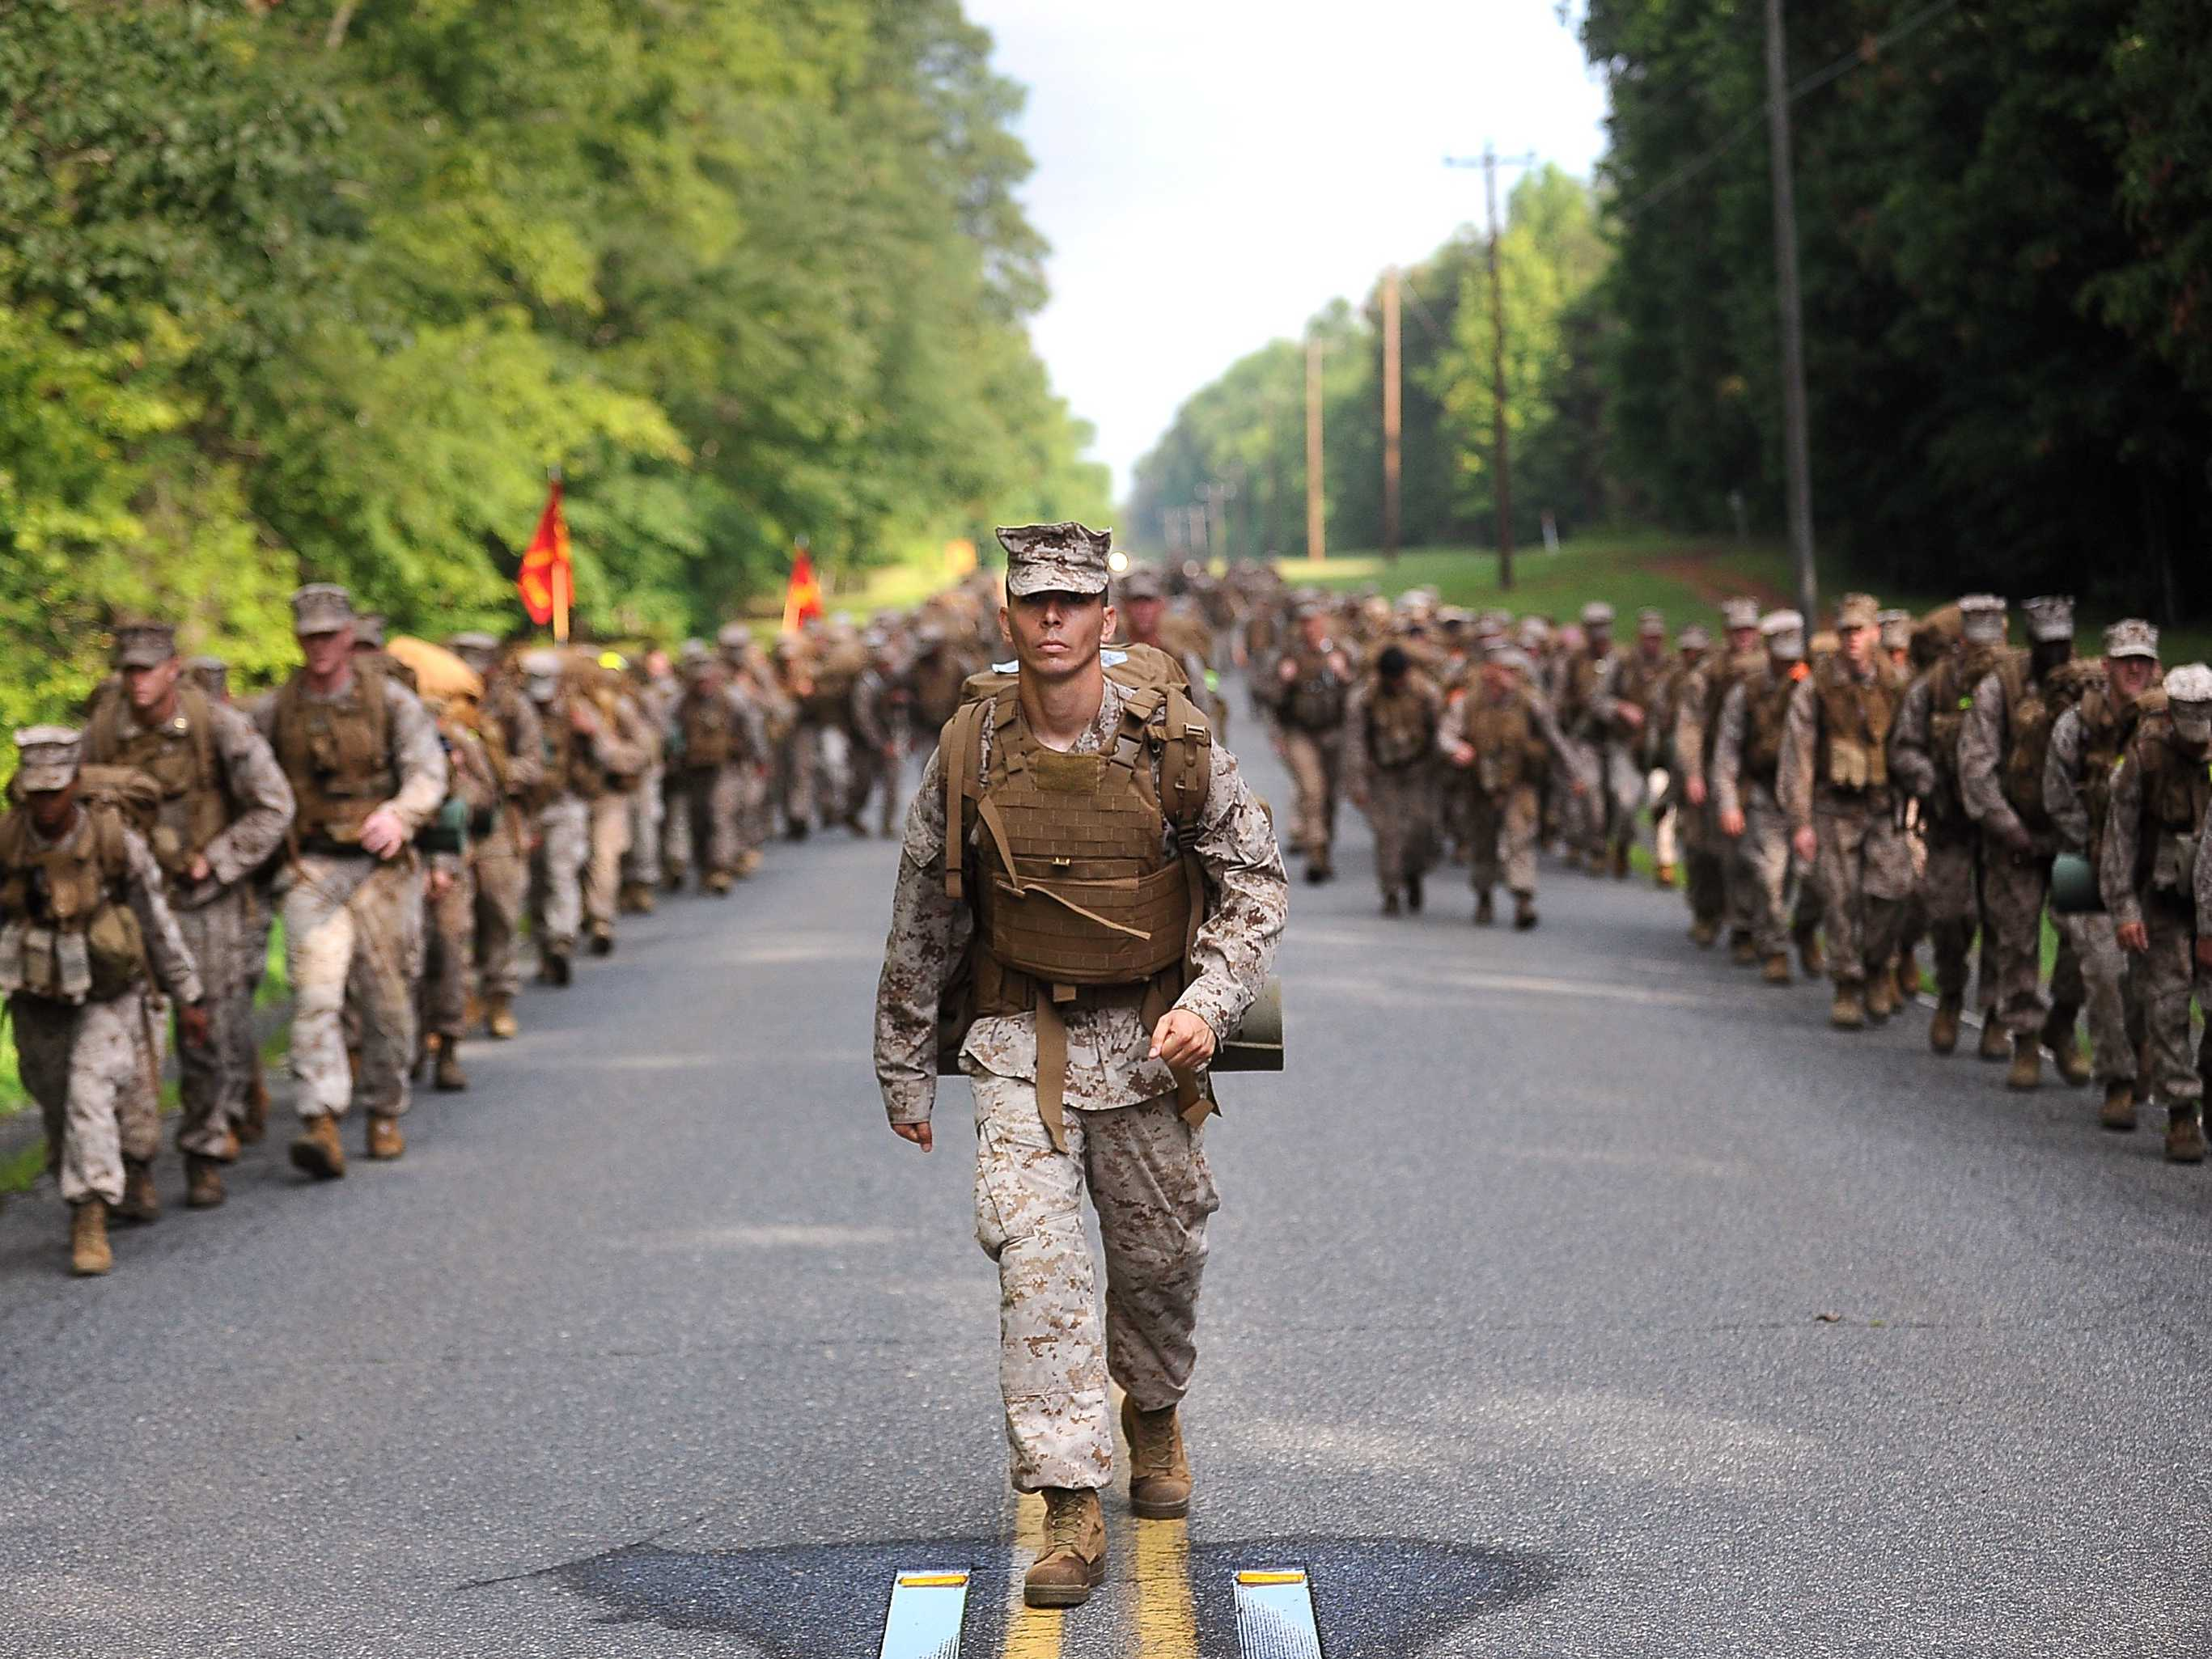 U.S. Sending 175 Marines To Romania As Part of Africa Crisis Team